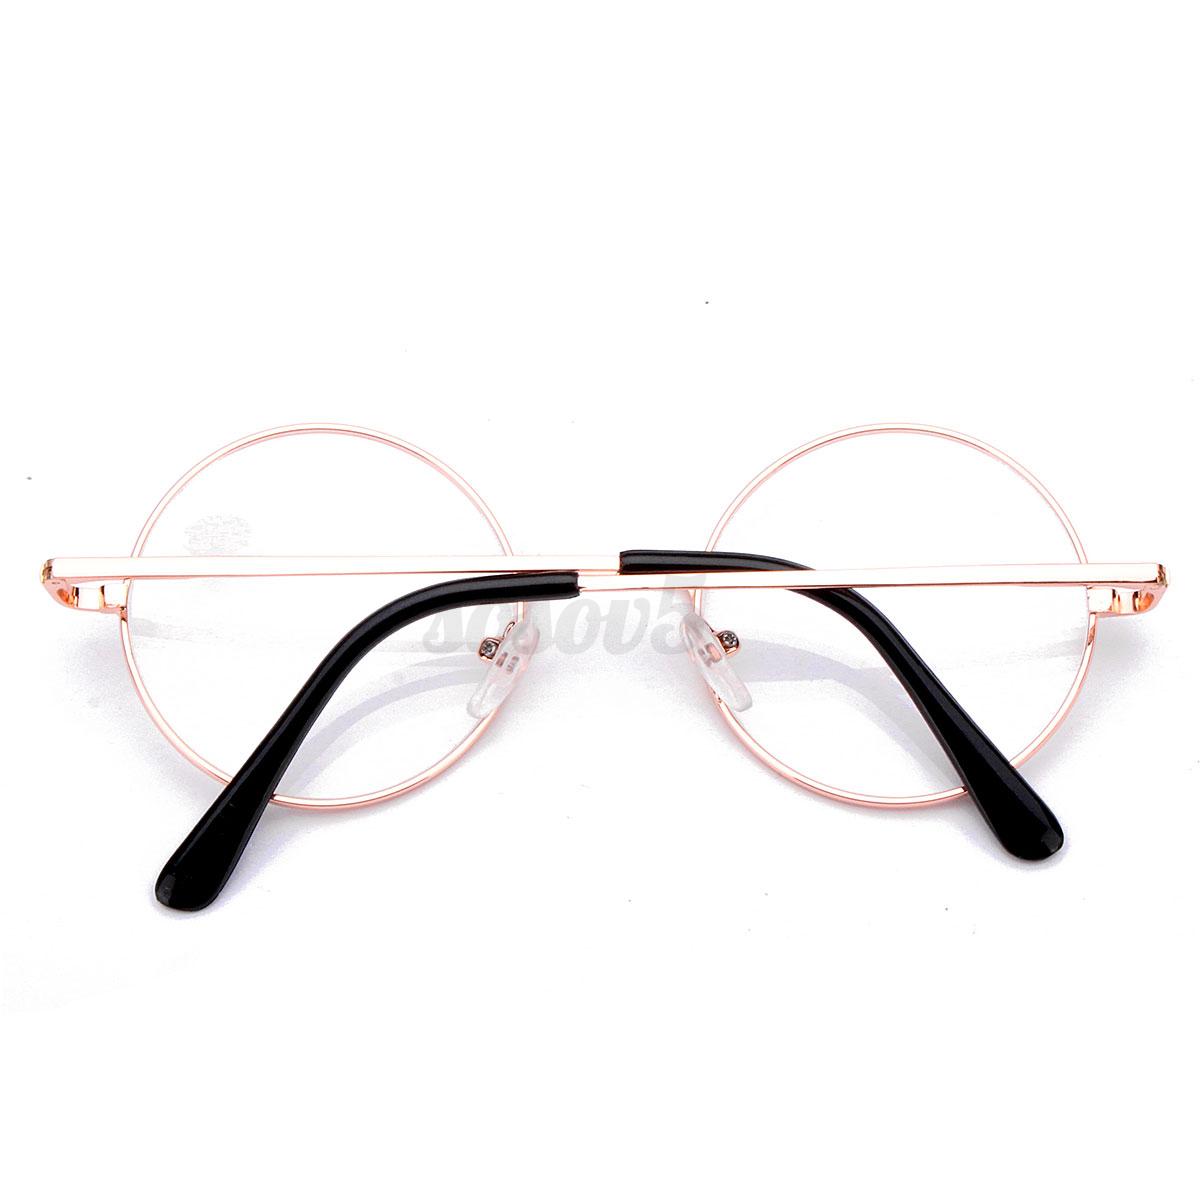 Understanding Eyeglass Frame Measurements : Unisex Retro Round Reading Glasses Presbyopic Metal Frame ...